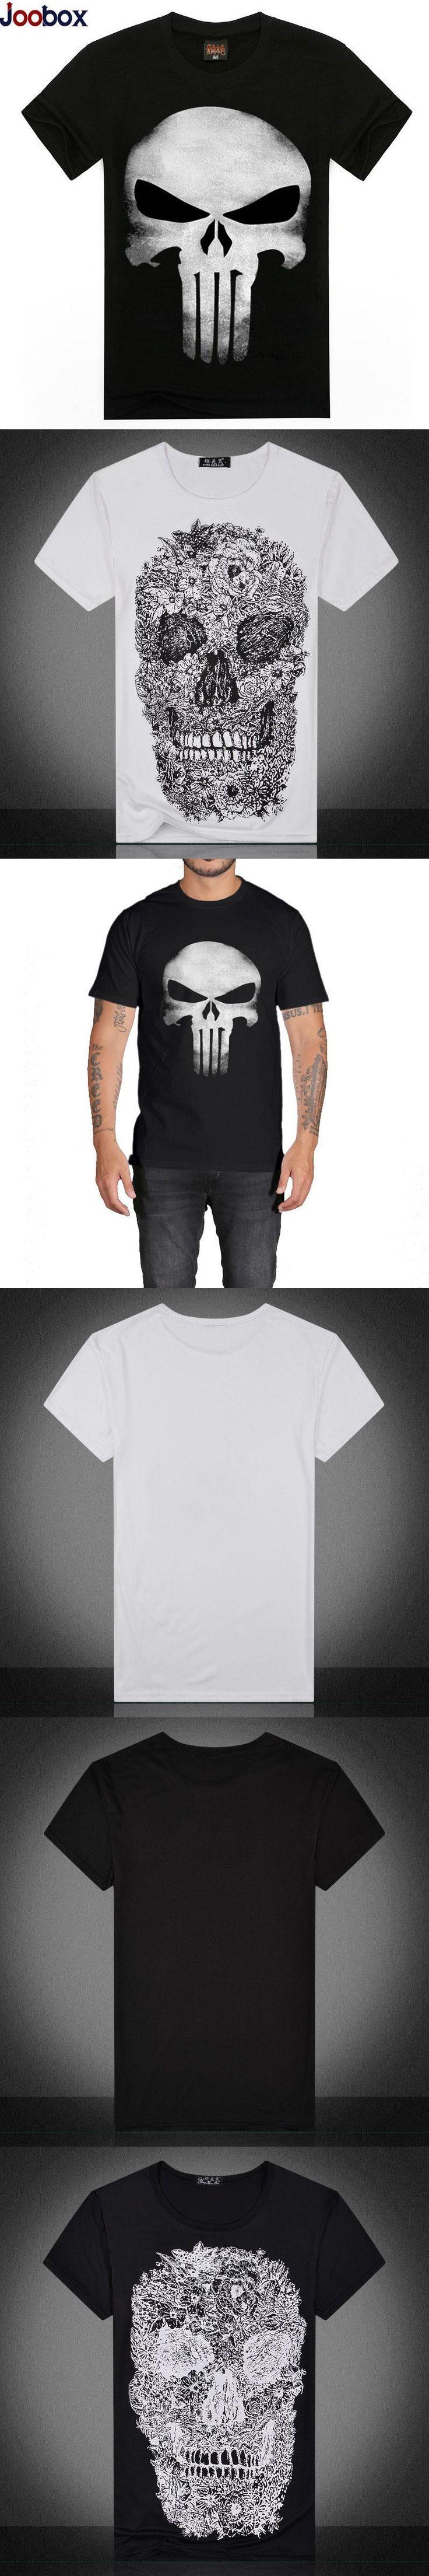 Punisher T shirt men New 2017 Skulls 3d t shirt Camisetas hombre Cotton Casual Short Sleeves tee shirt homme punisher tshirt men